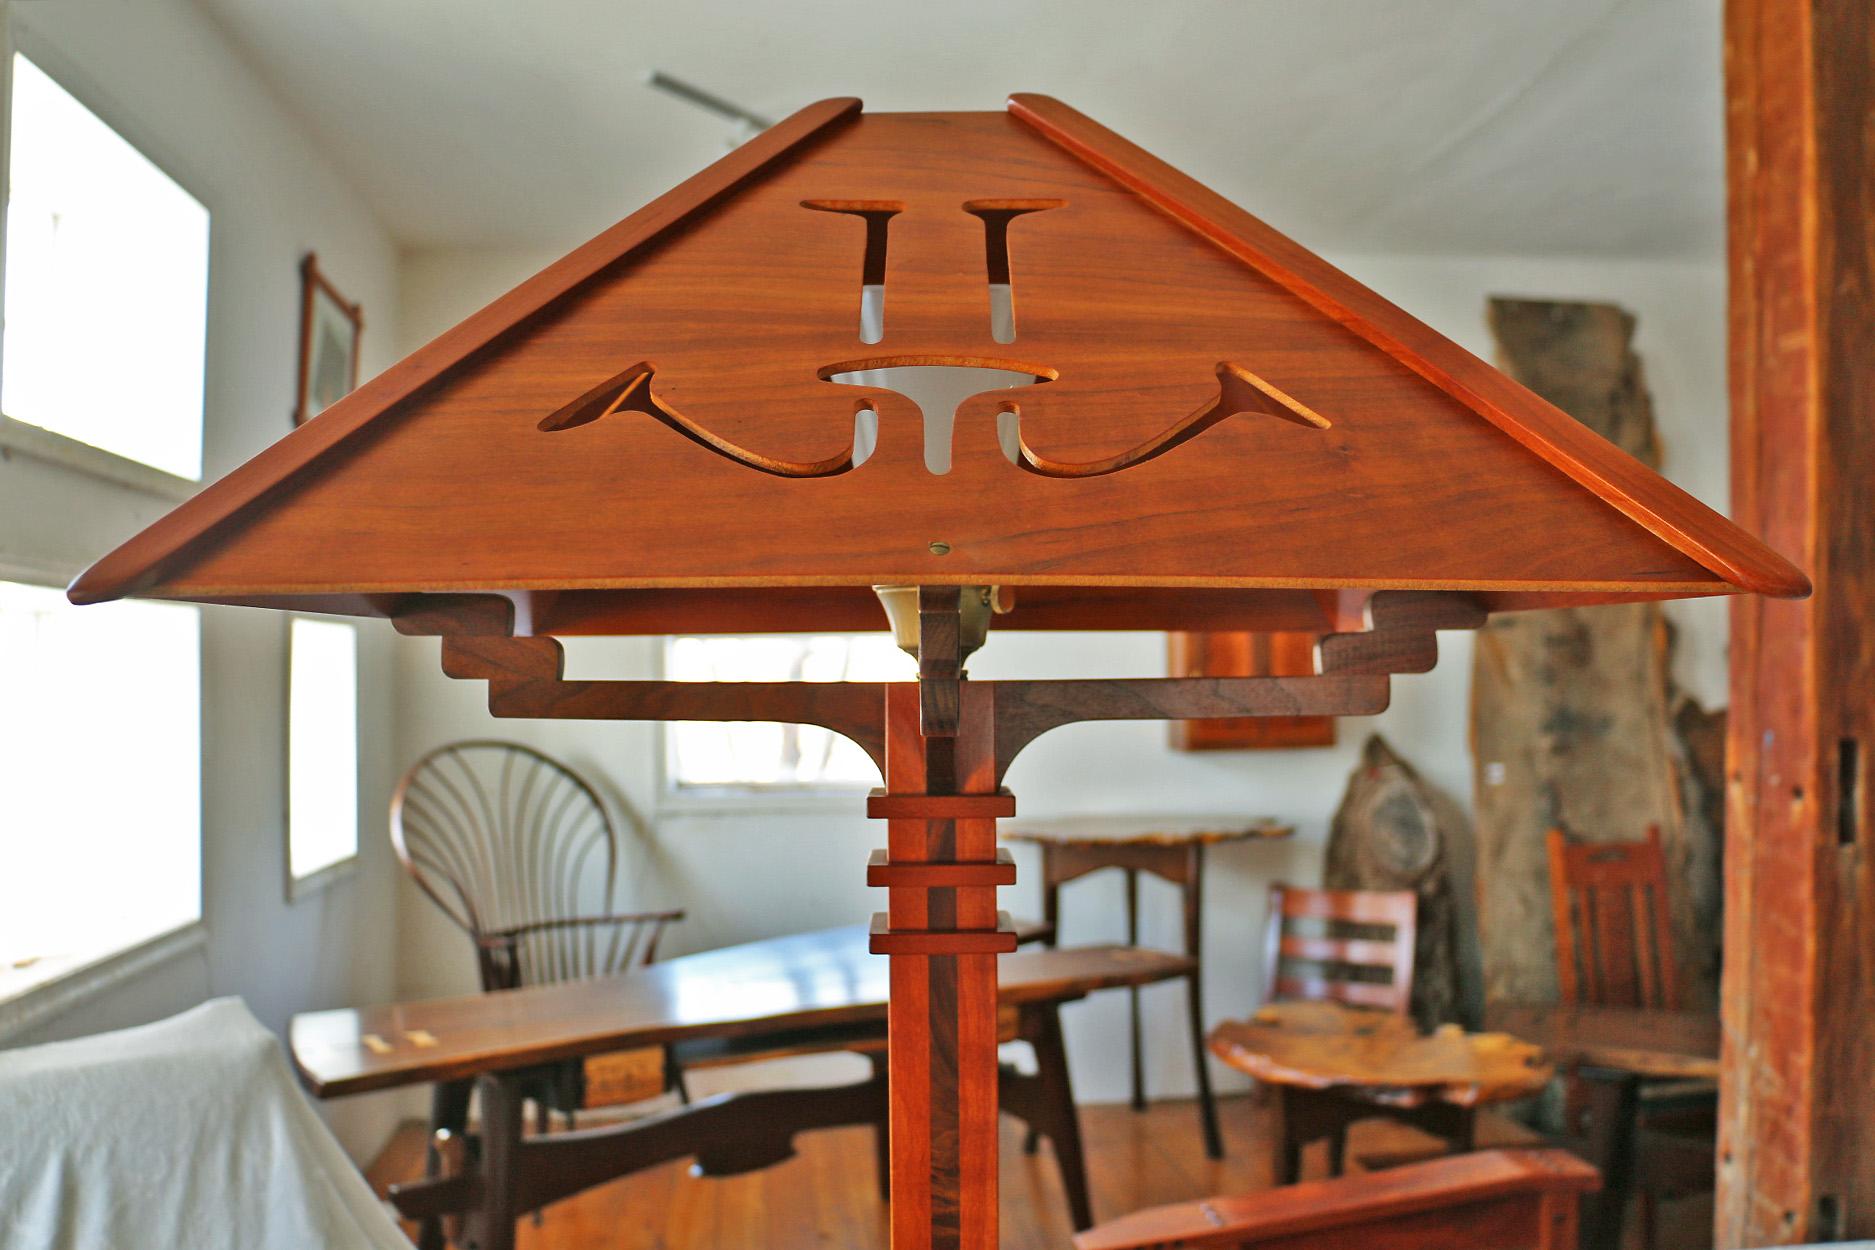 Wooden Lamp Shade Detail.jpg